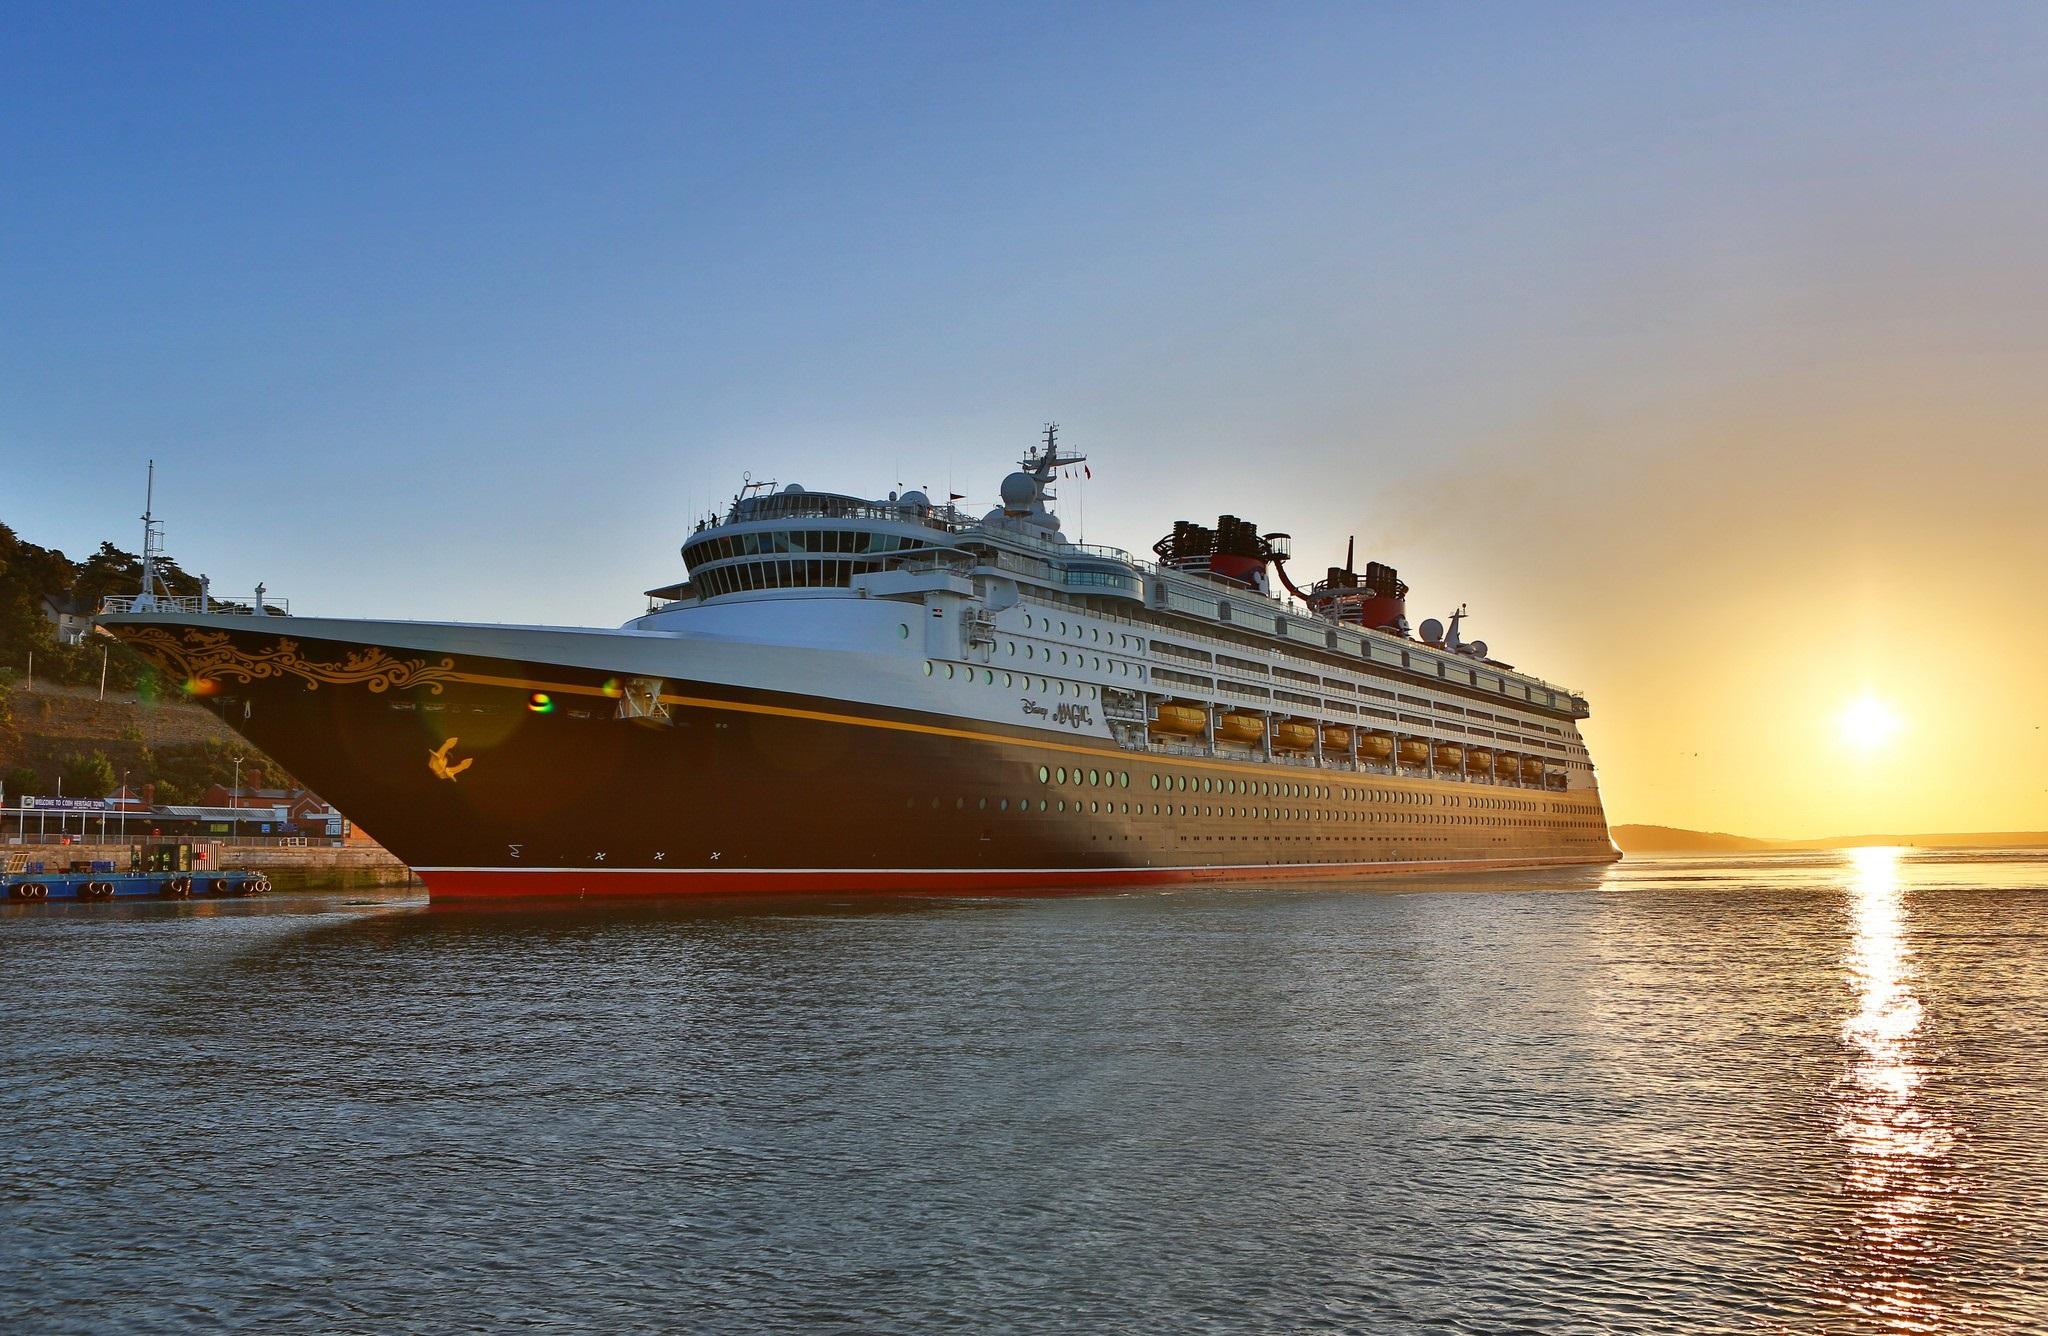 Cruise Ship Hd Wallpaper Background Image 2048x1336 Id1009254